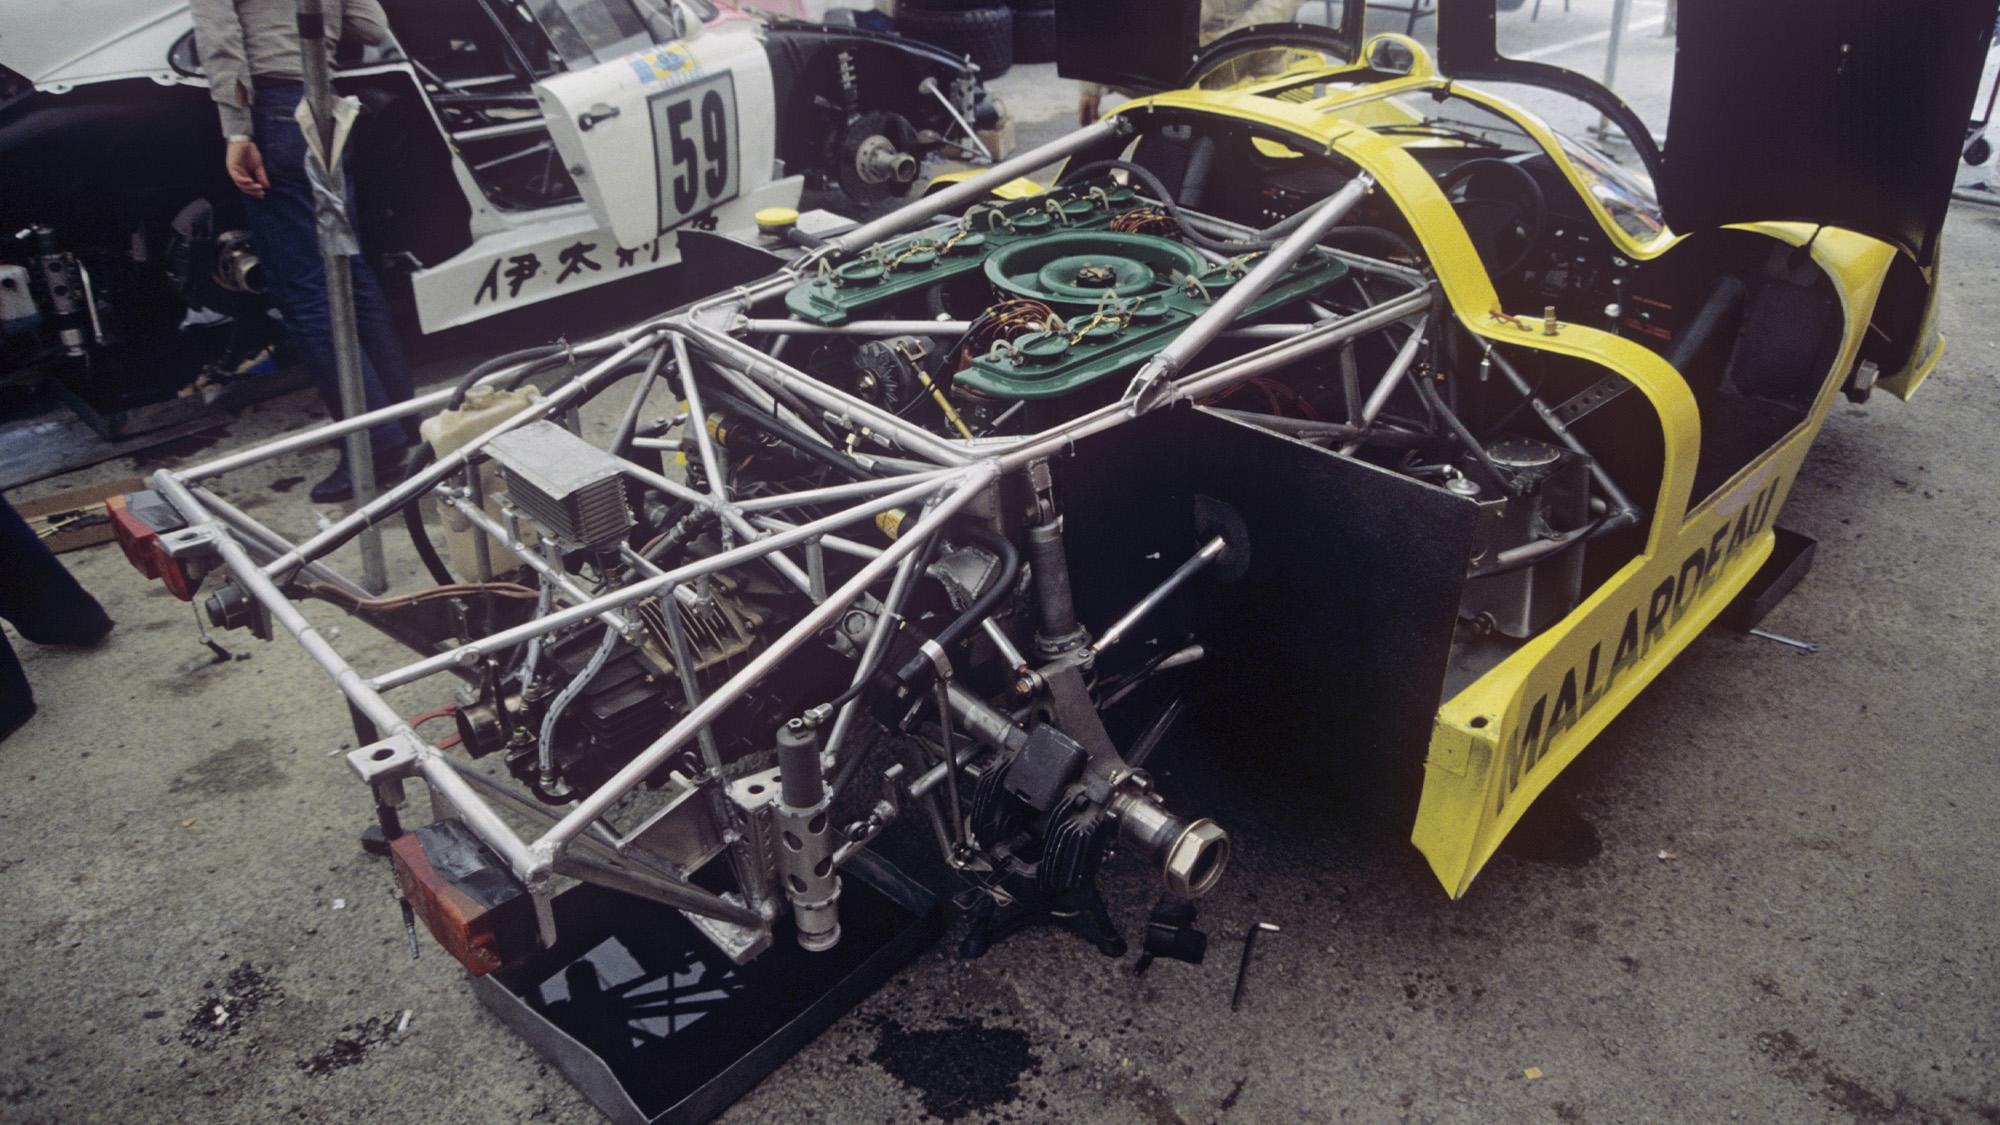 Kremer 917 chassis